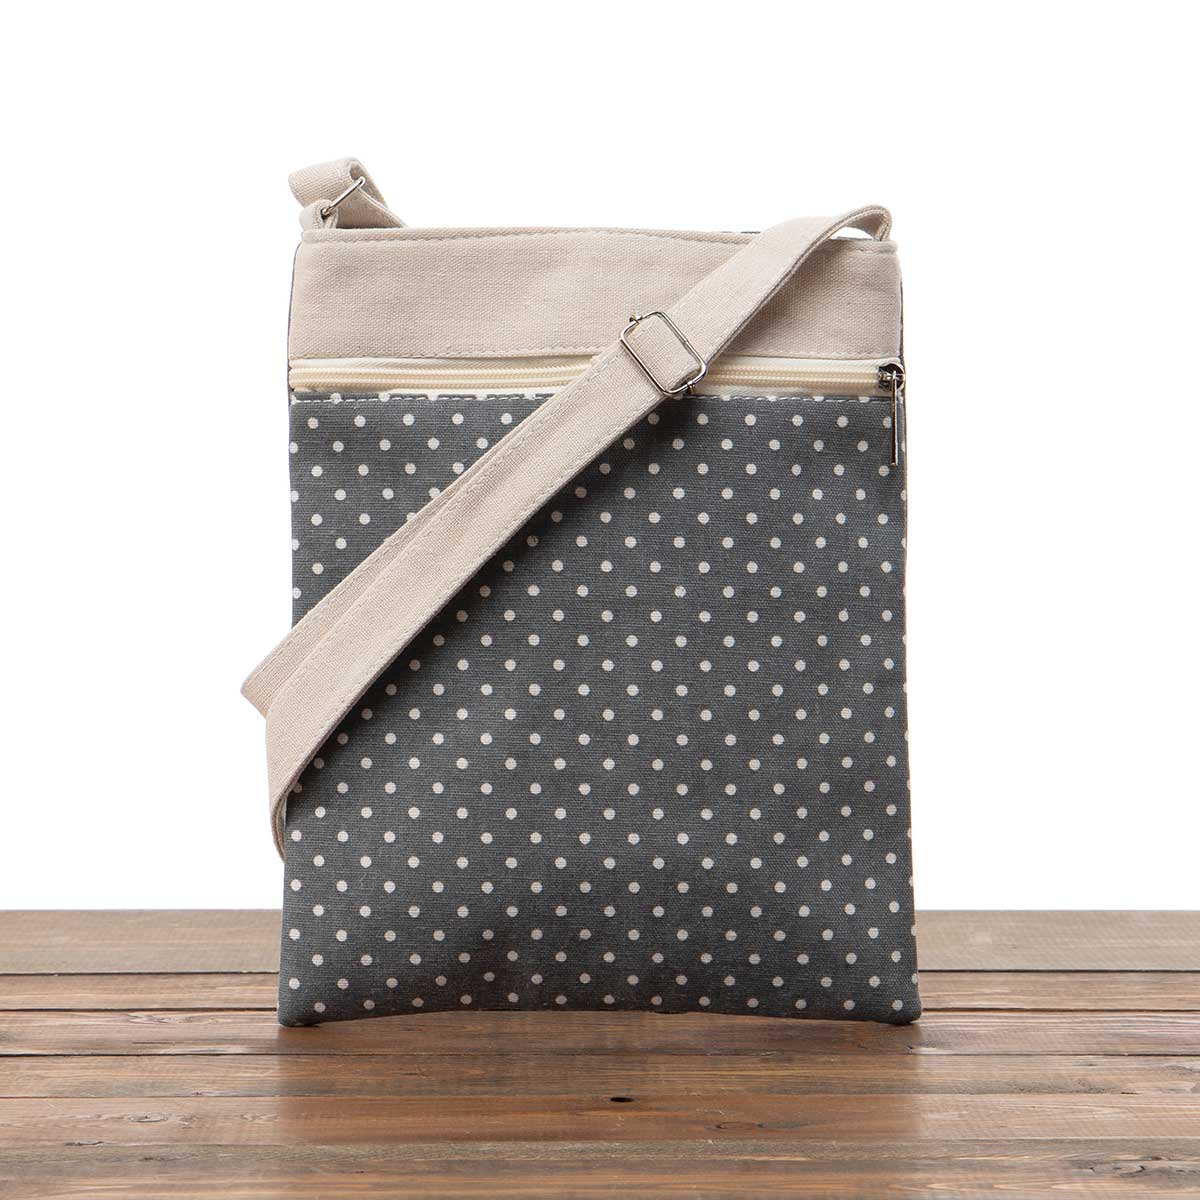 "Grey Polka Dot Canvas Cross-body Bag 9""x11""x2"""